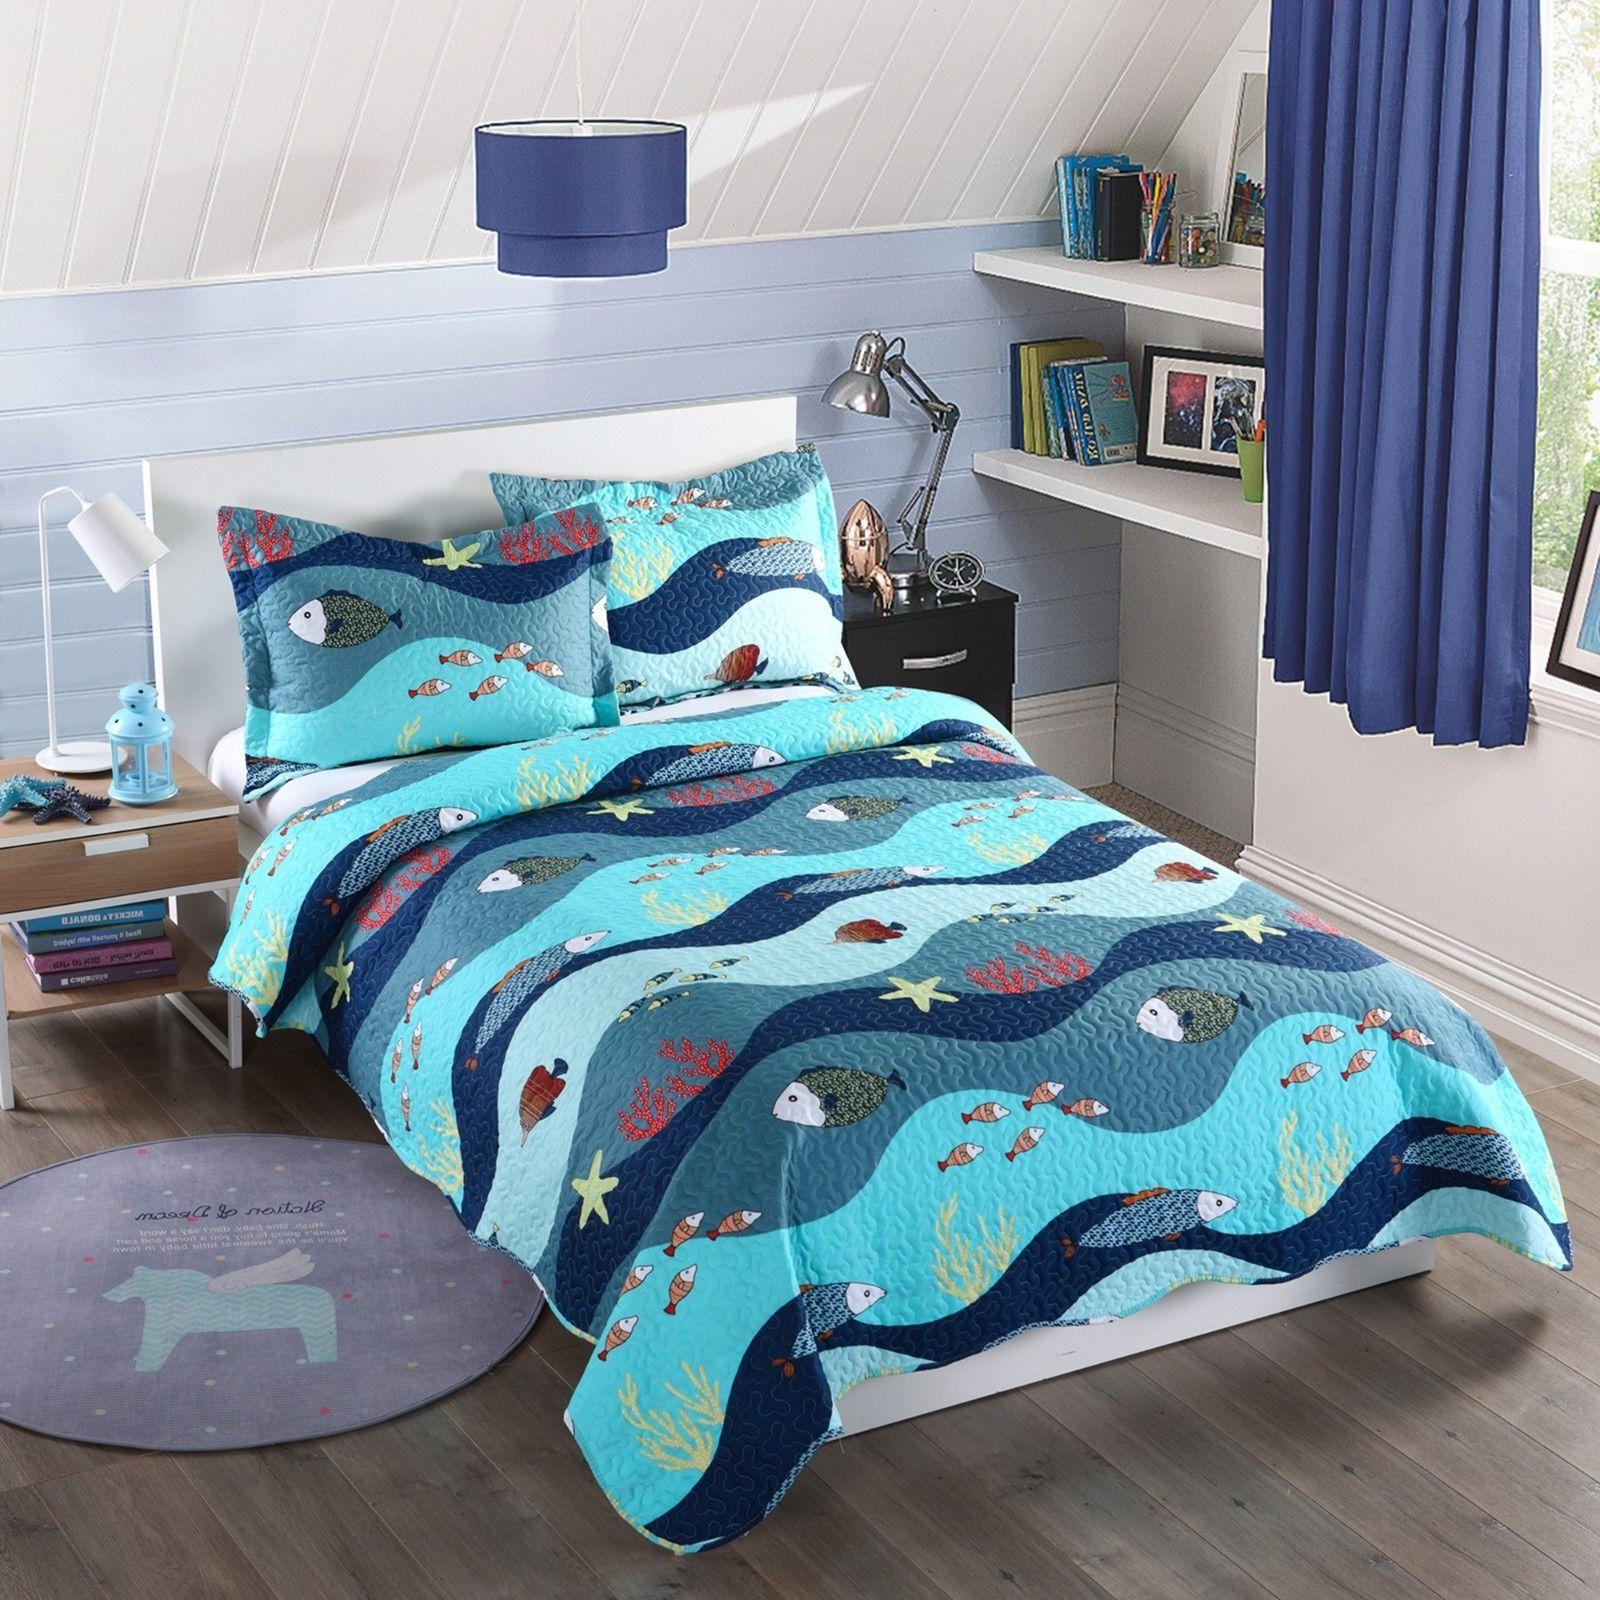 2pcs kids quilt bedspread comforter set throw